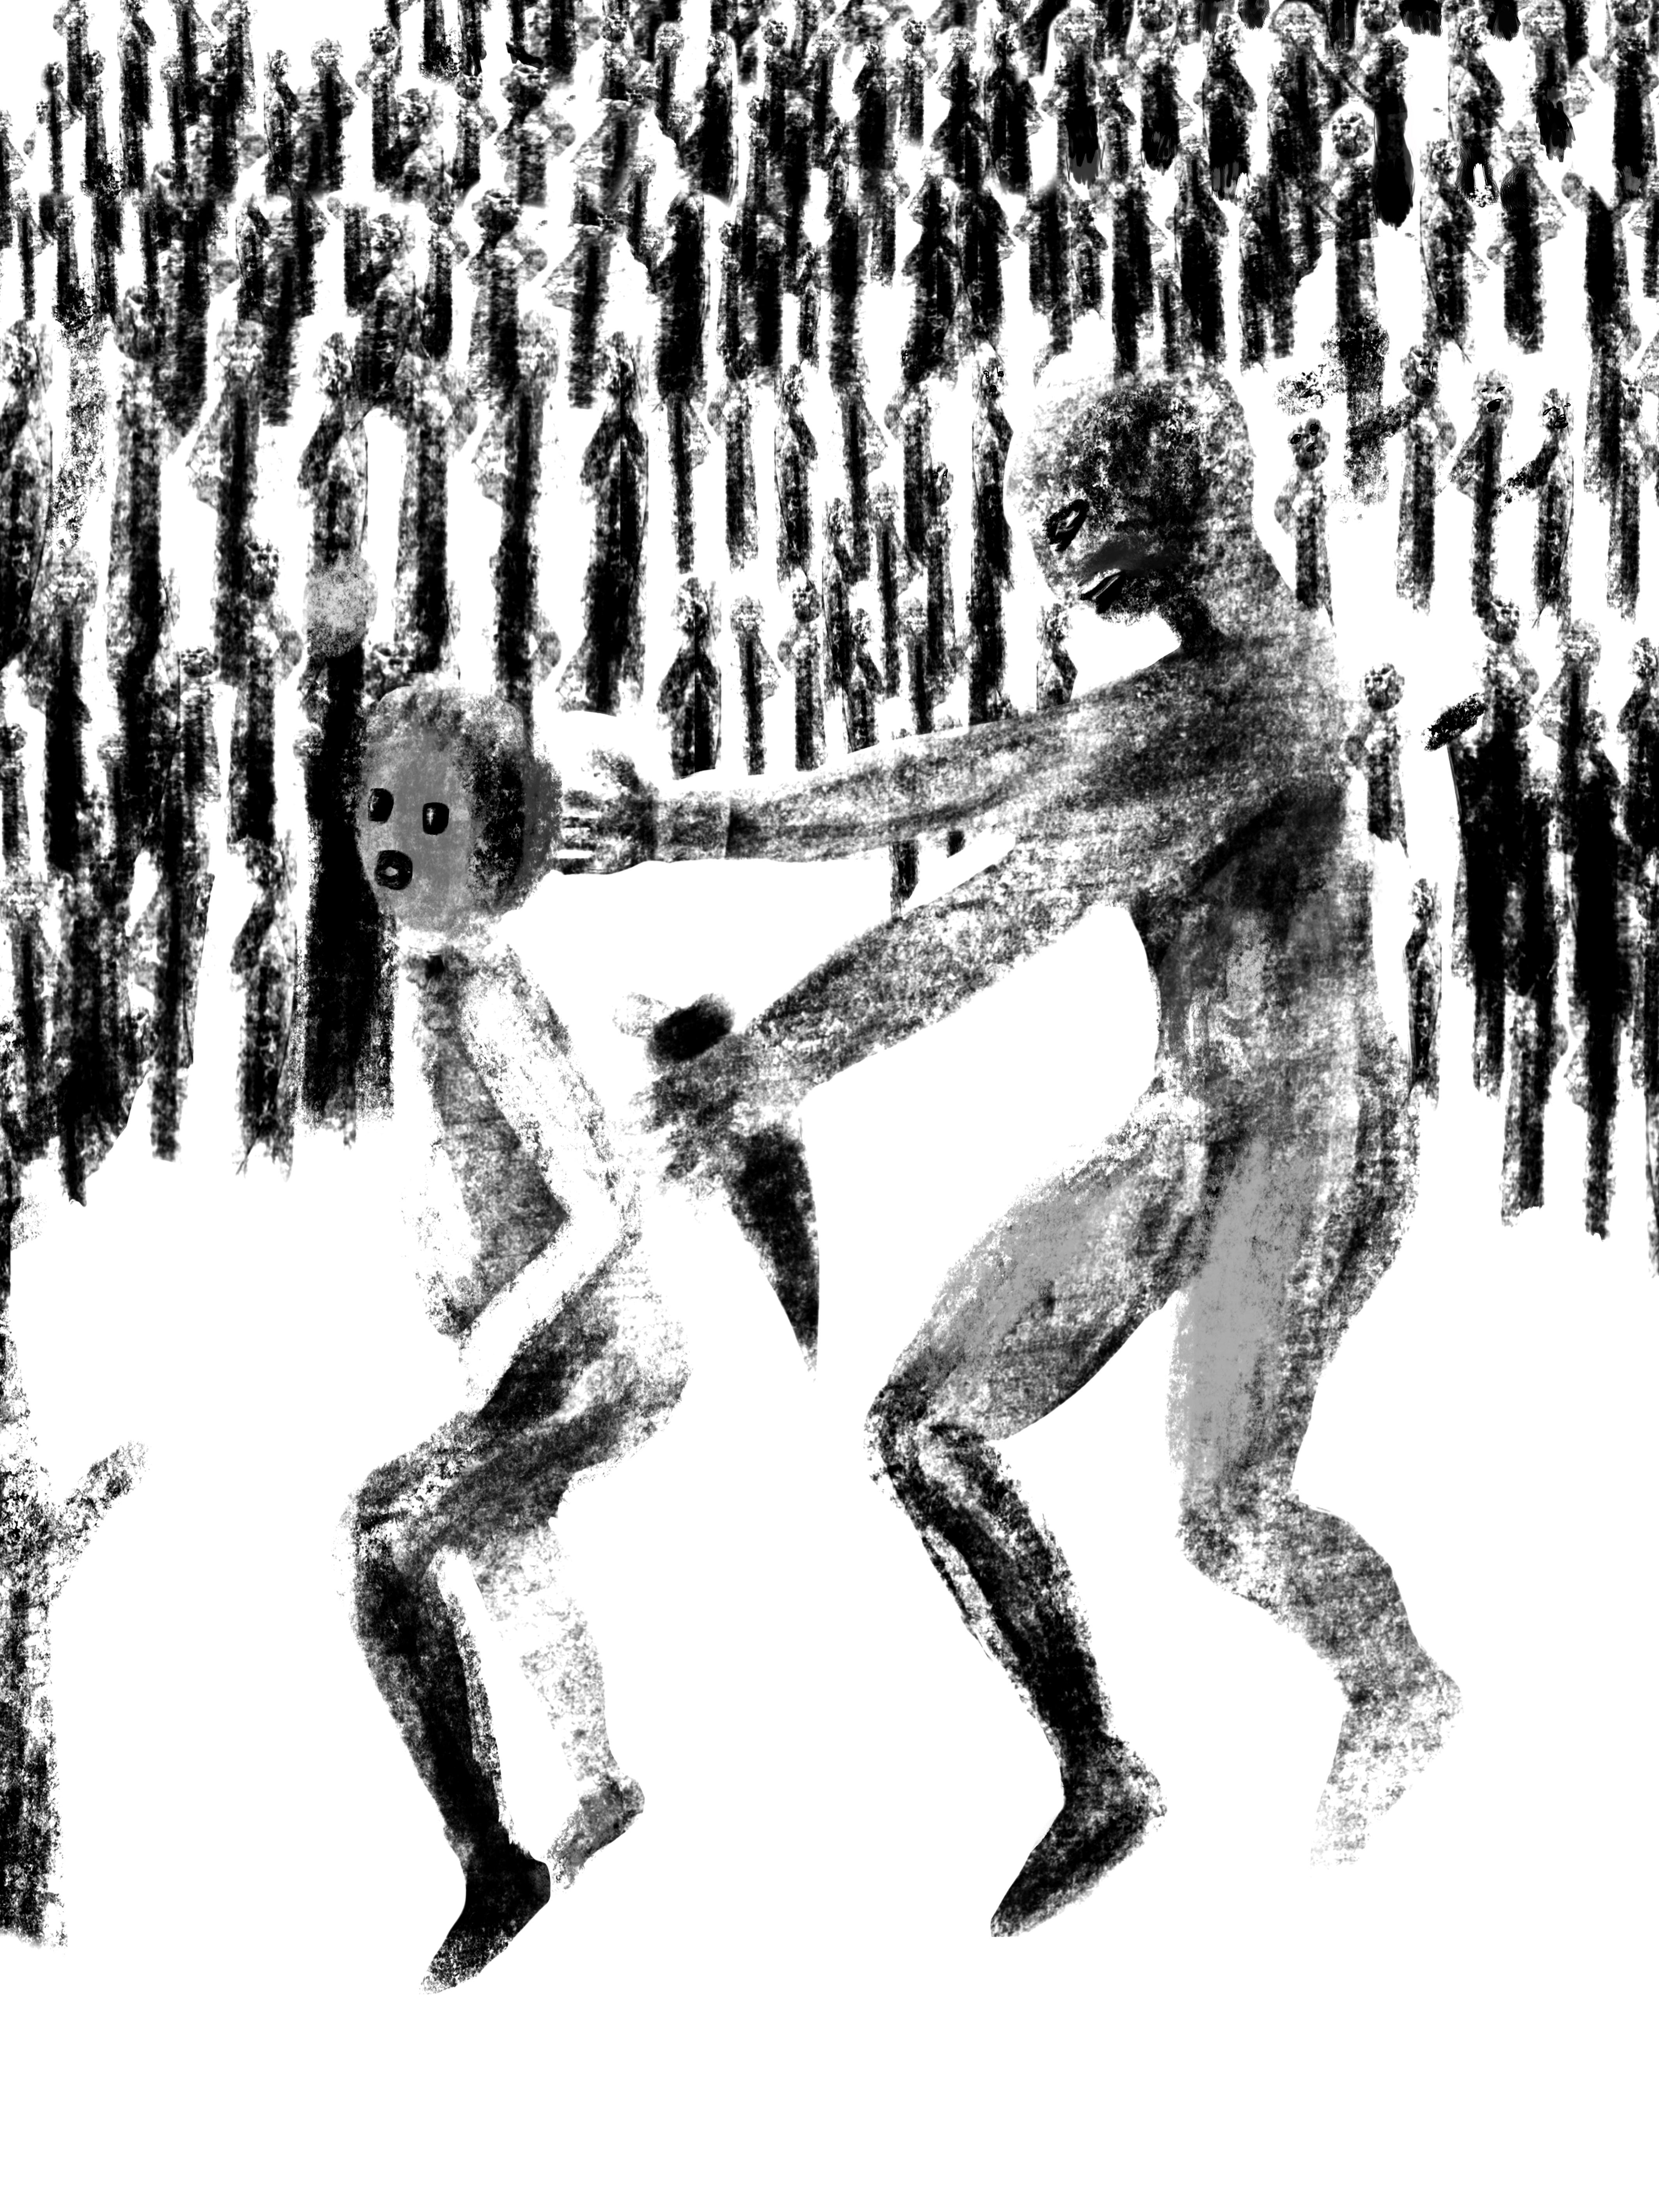 150x200 cm -print- Ipad painting